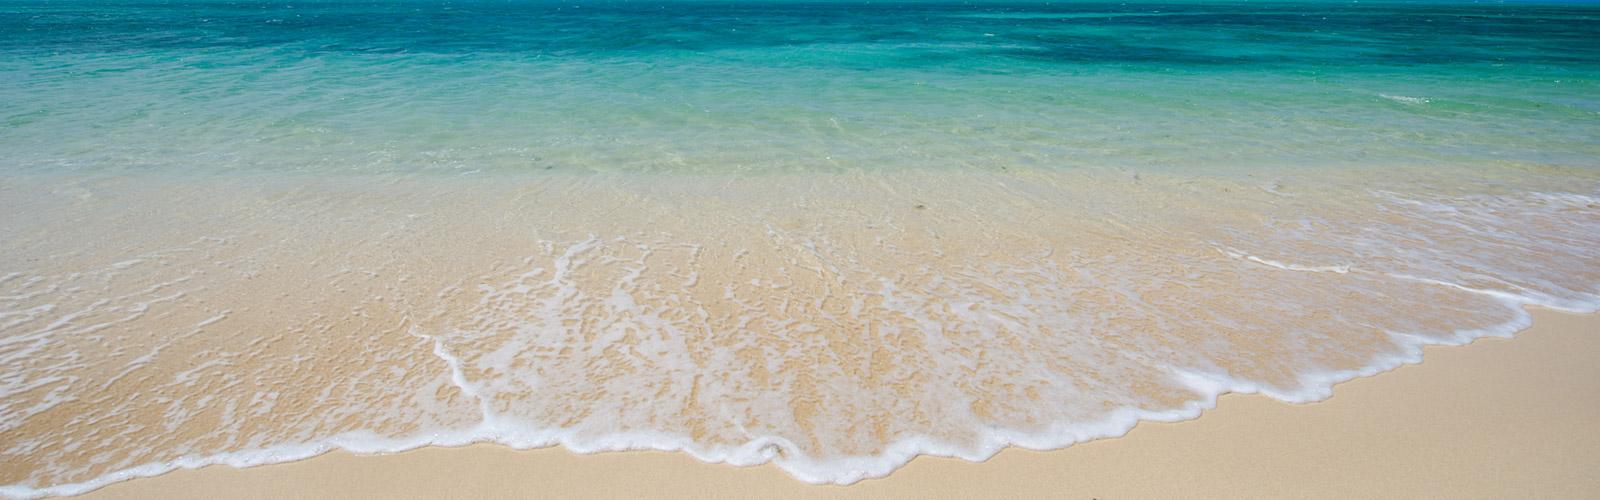 Great Barrier Reef Whitehaven Beach